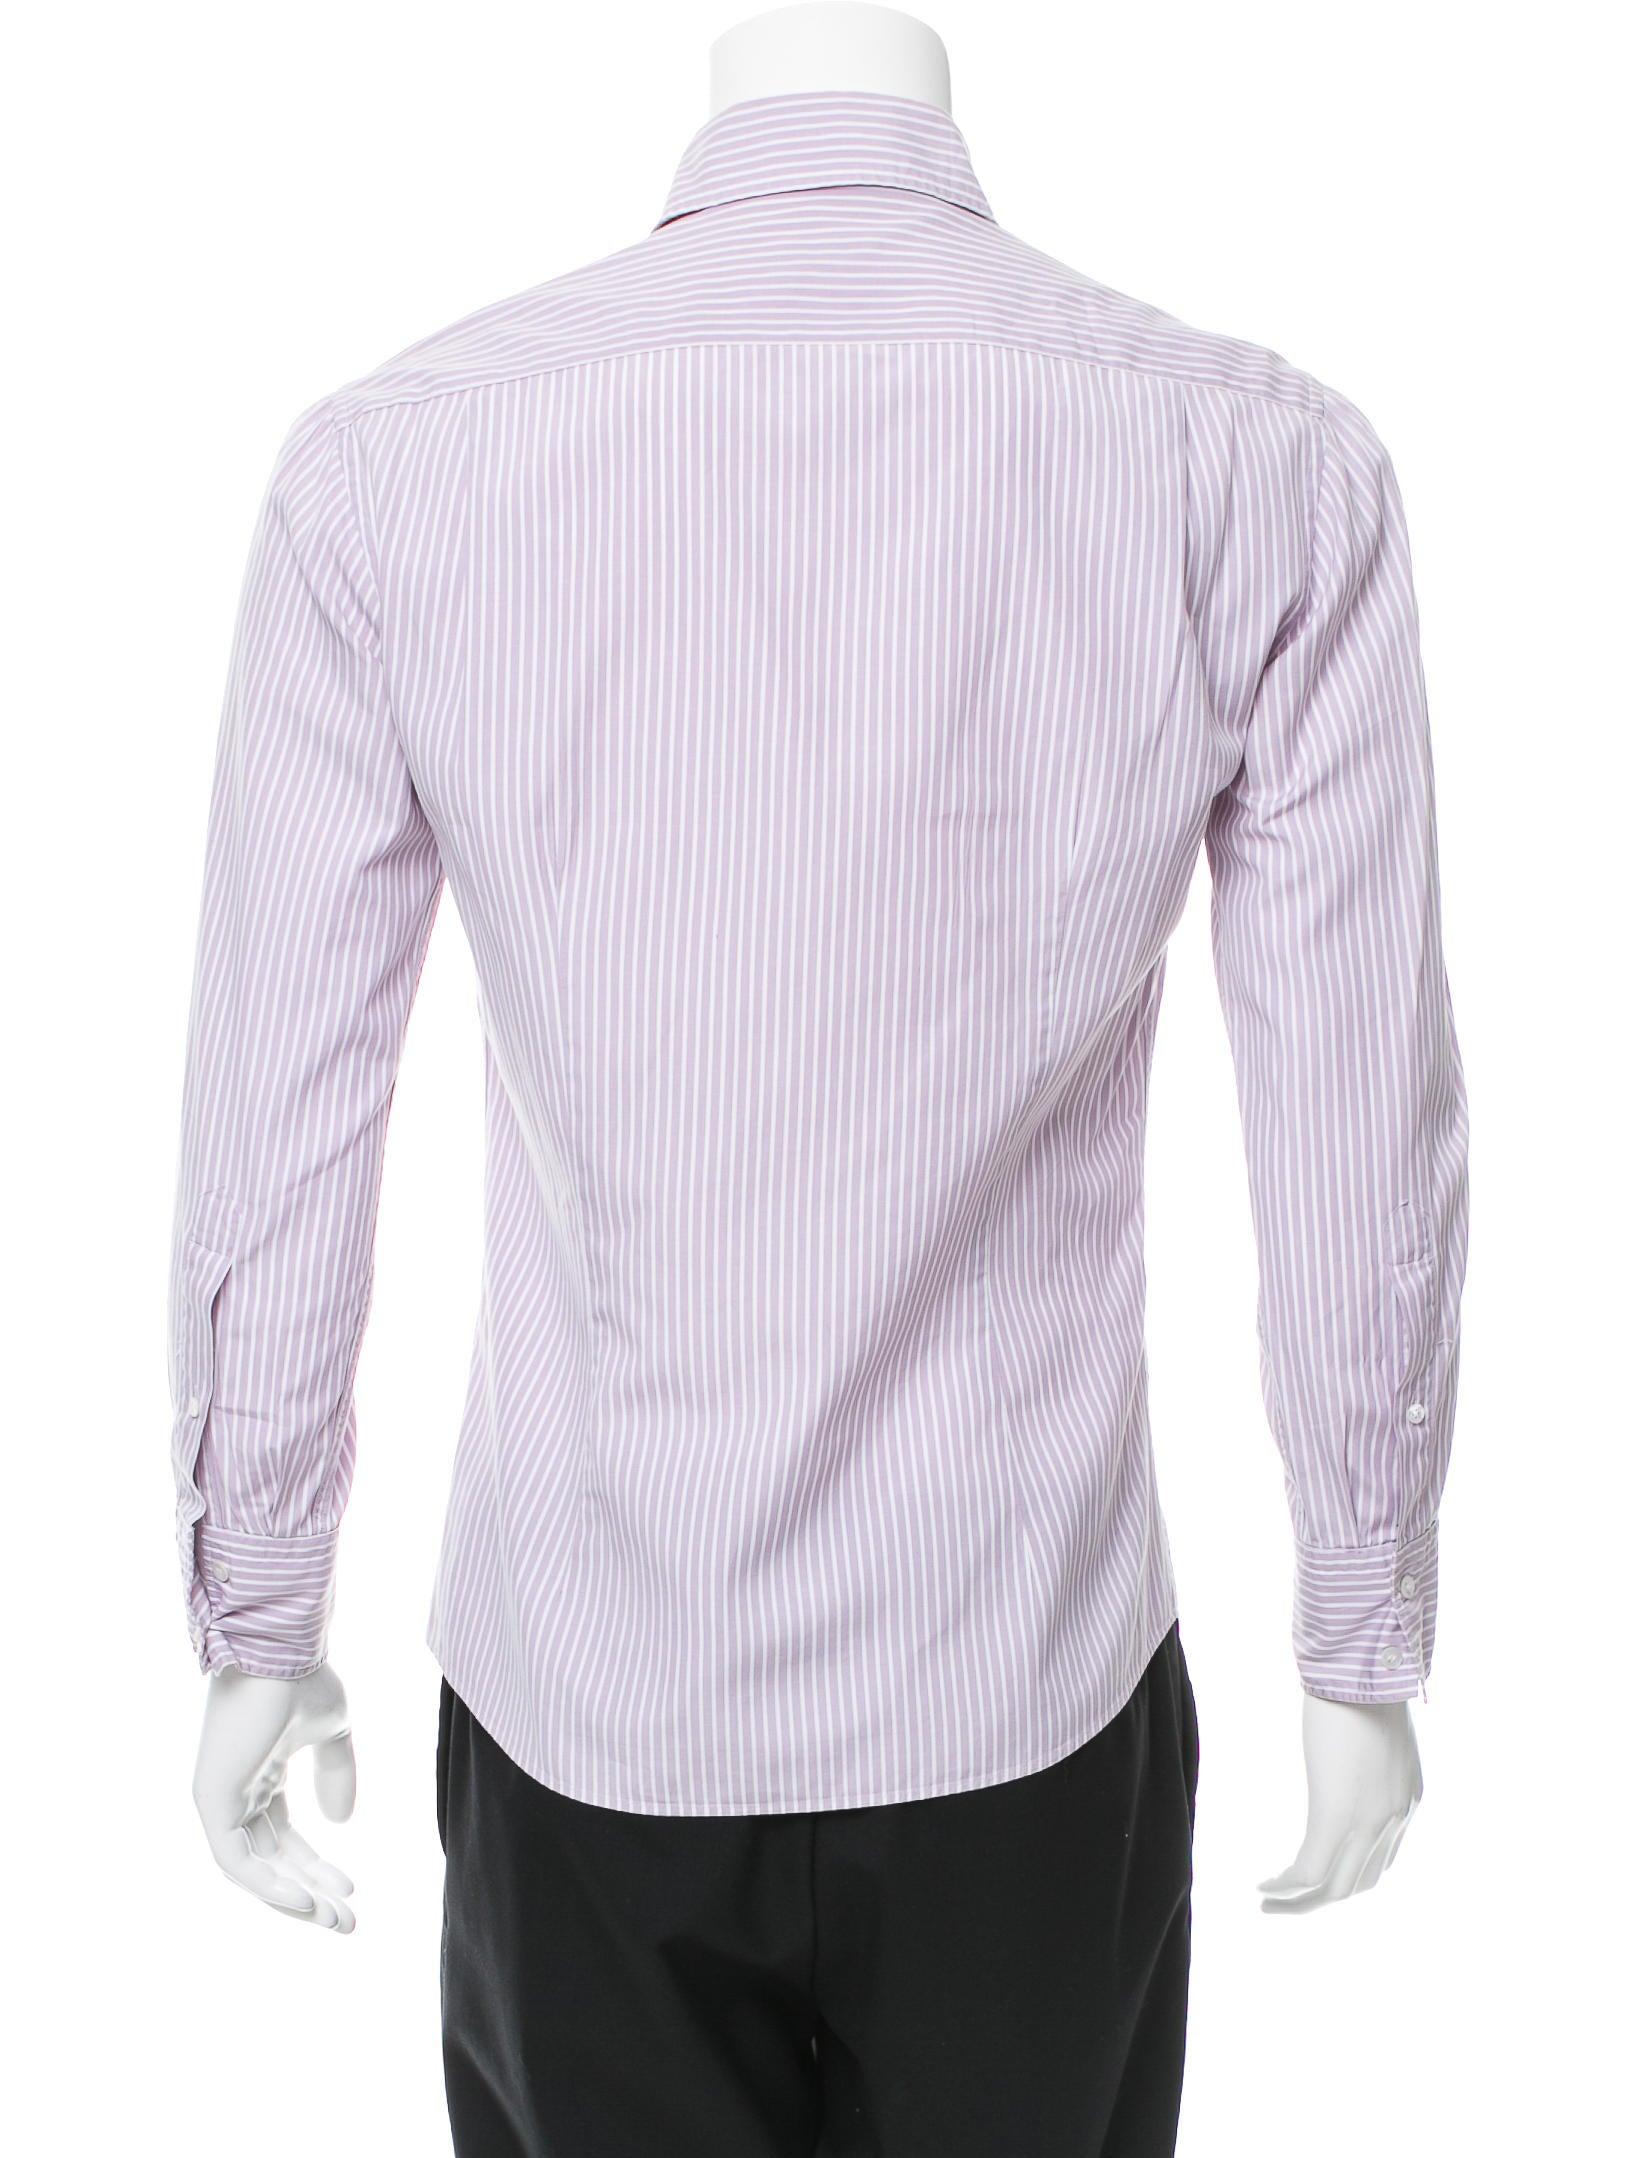 Michael bastian striped button up shirt clothing for Striped button up shirt mens